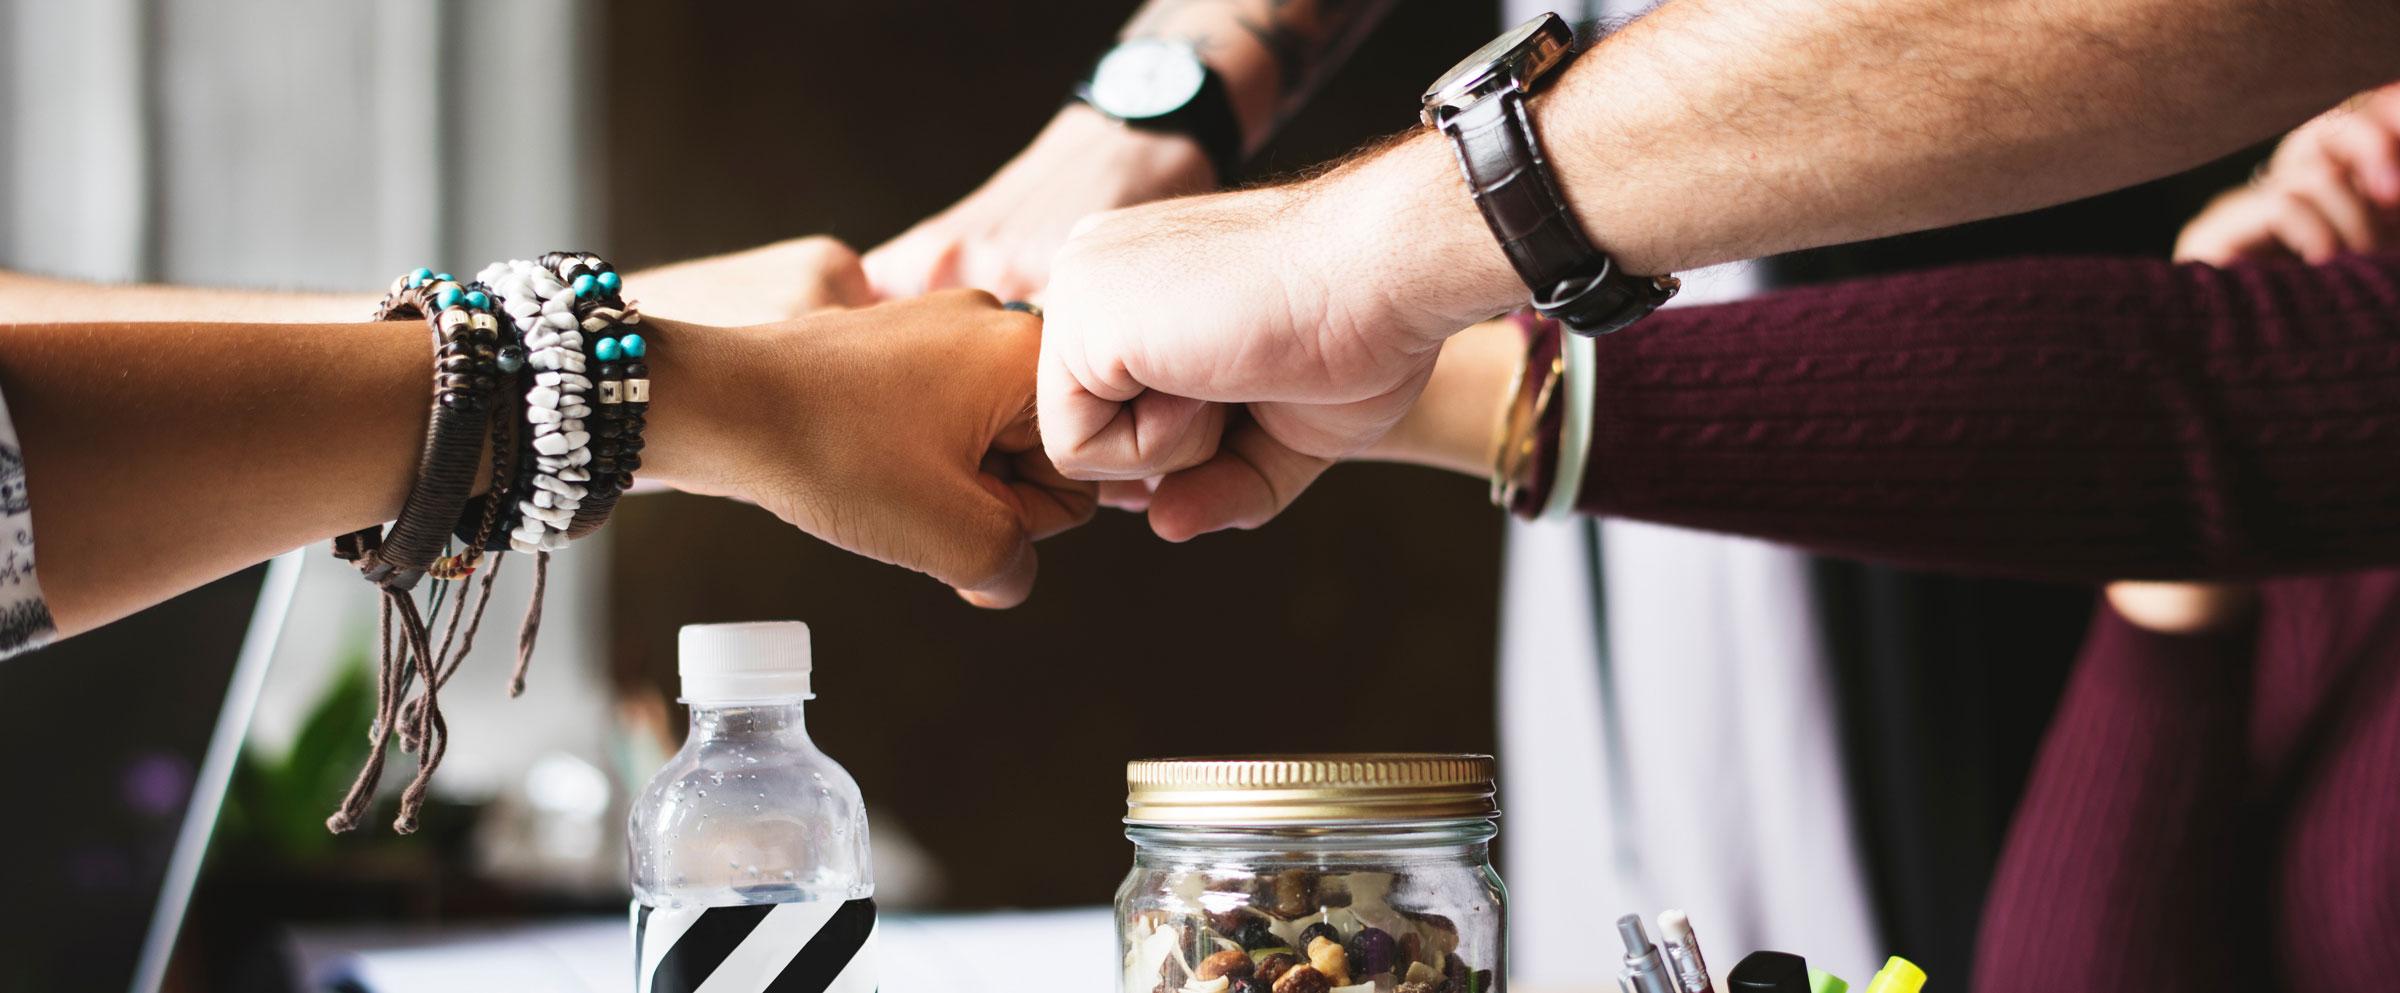 mentorship-collaboration-banner-nonprofits